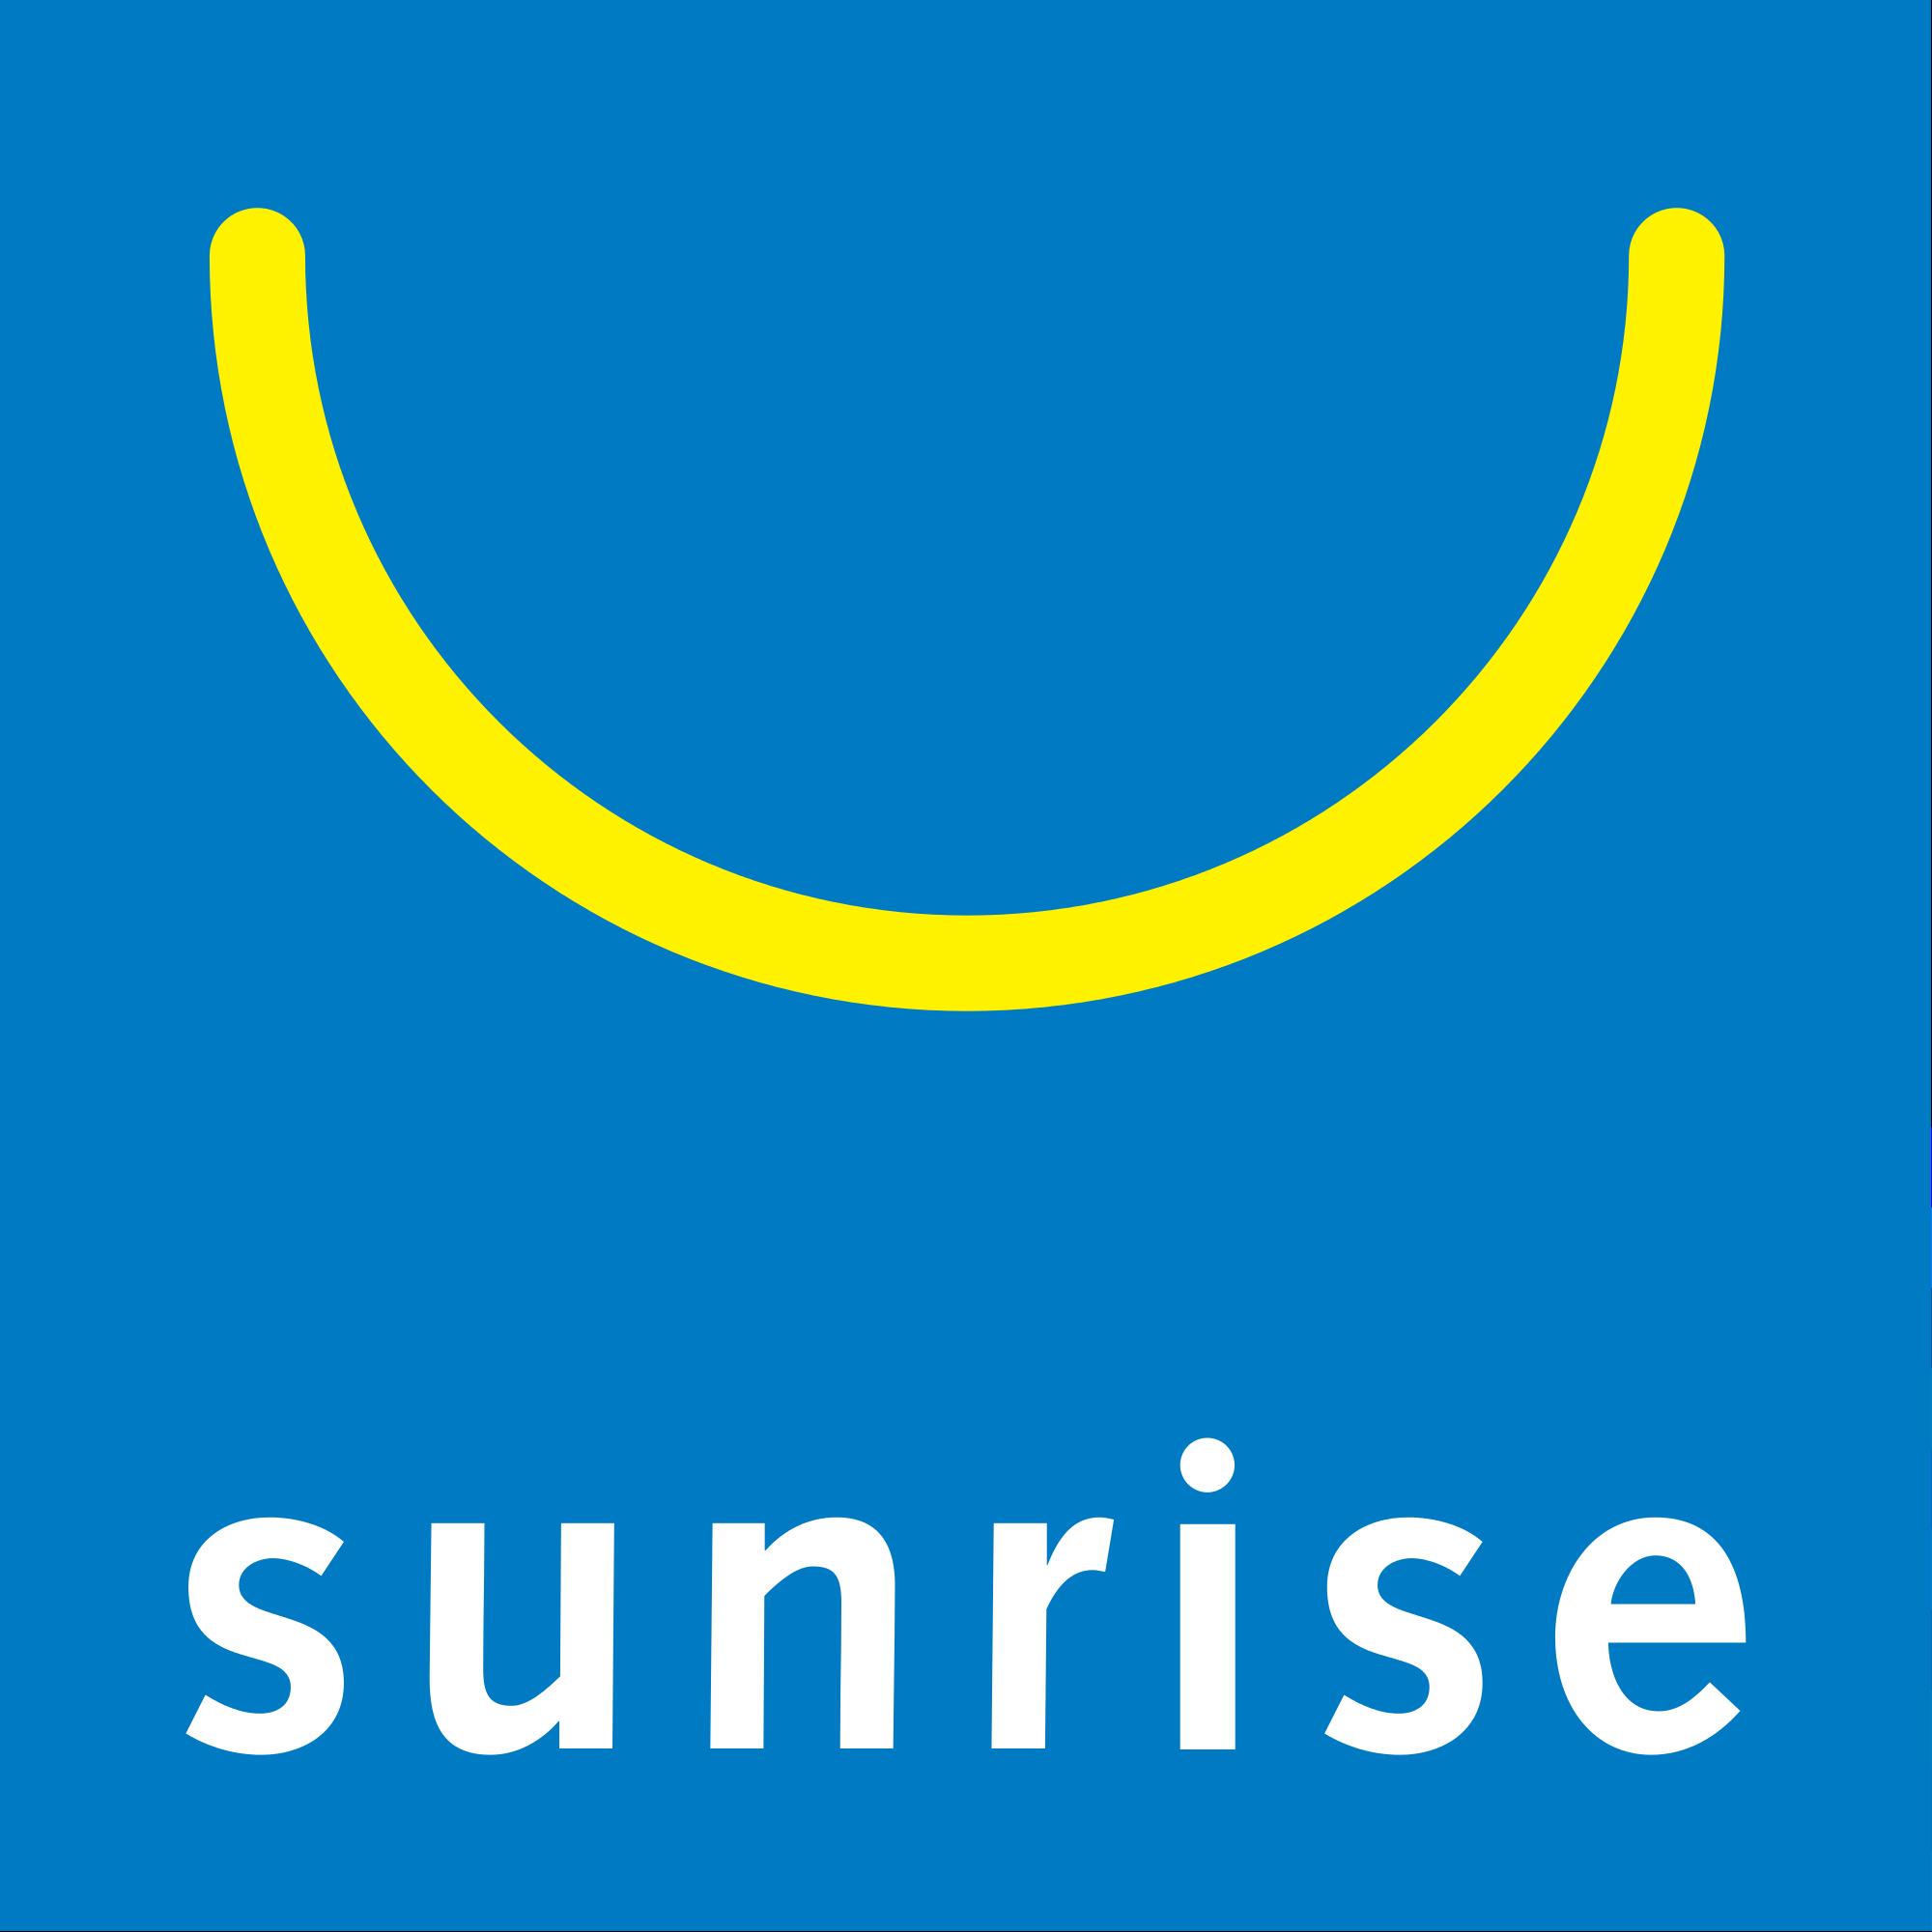 Sunrise svg #14, Download drawings